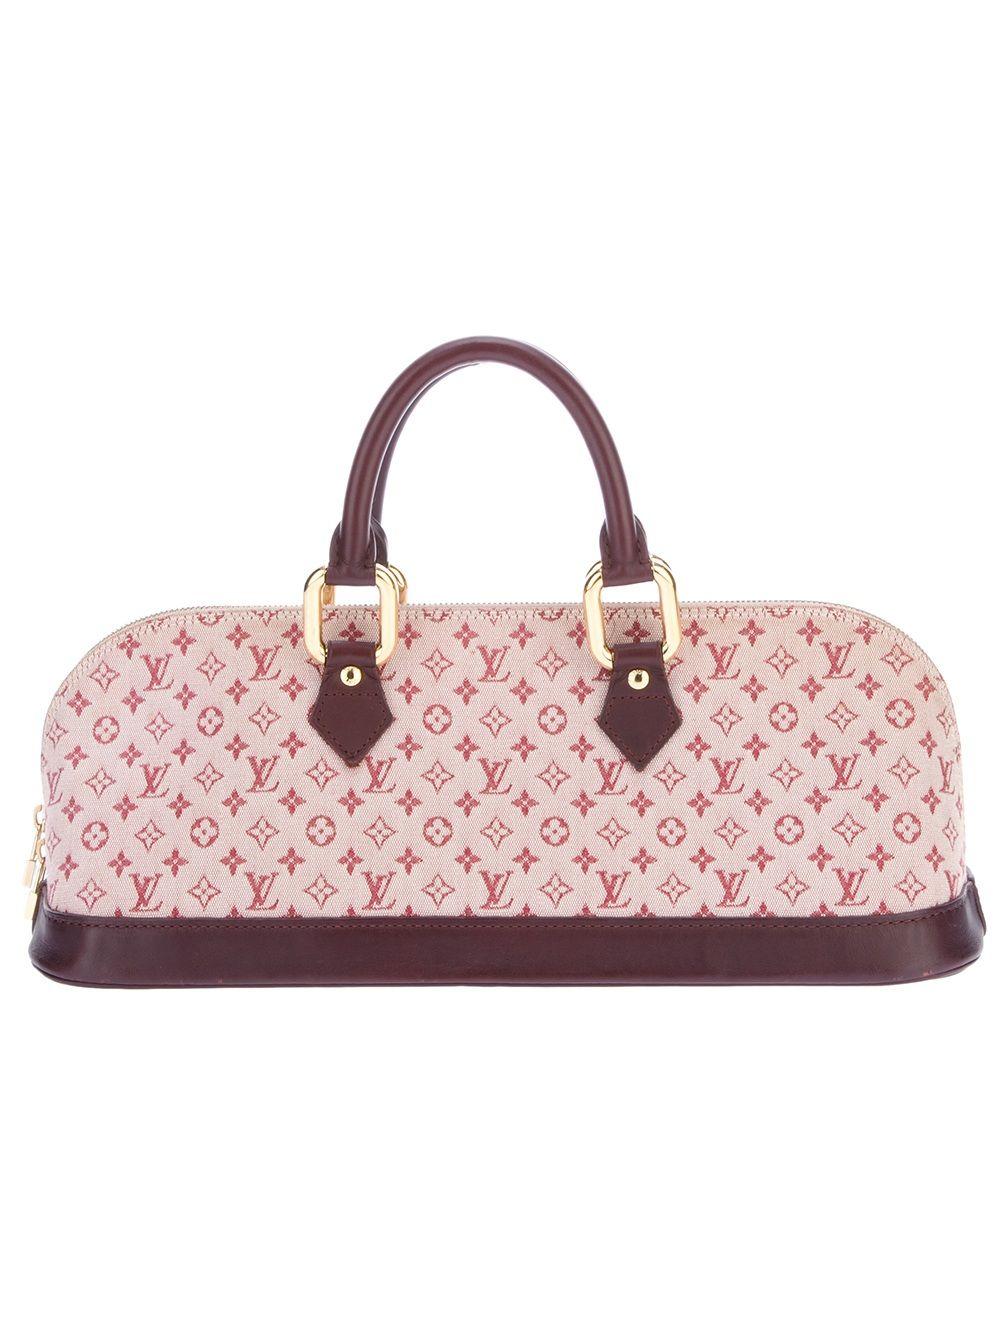 b4c2cd60681a3 Louis Vuitton Vintage Idylle Monogram Tote - A.N.G.E.L.O Vintage - farfetch .com